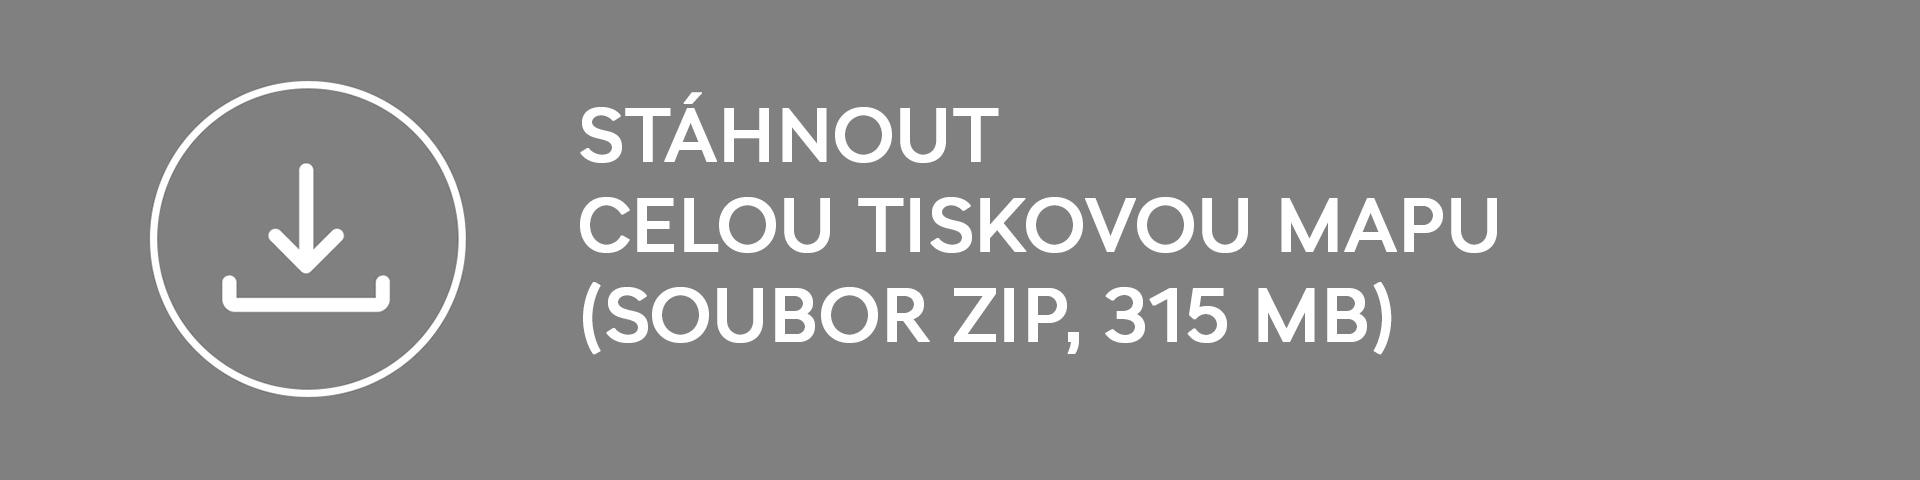 13_download-cz-1